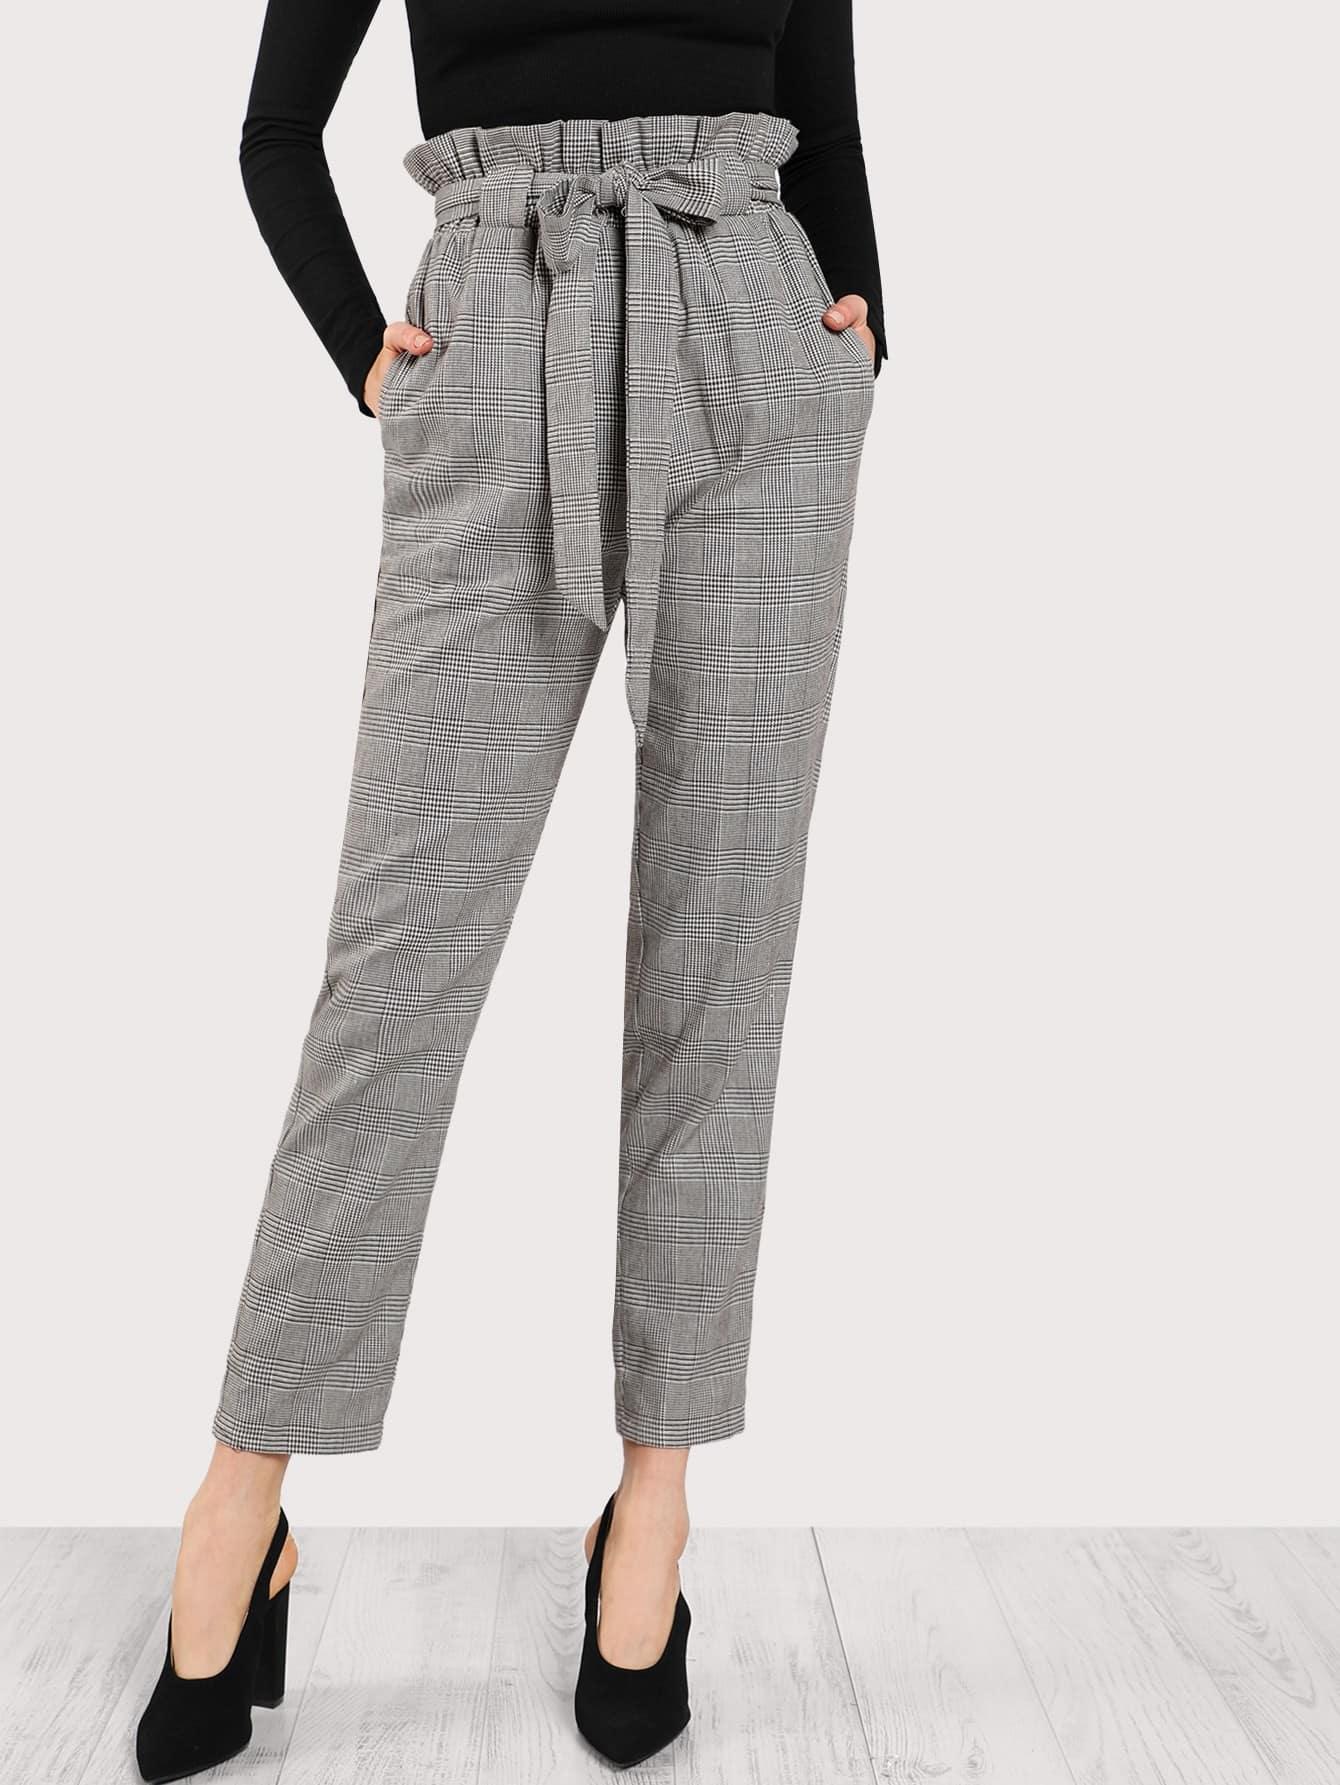 Image of Frilled Tie Waist Plaid Pants